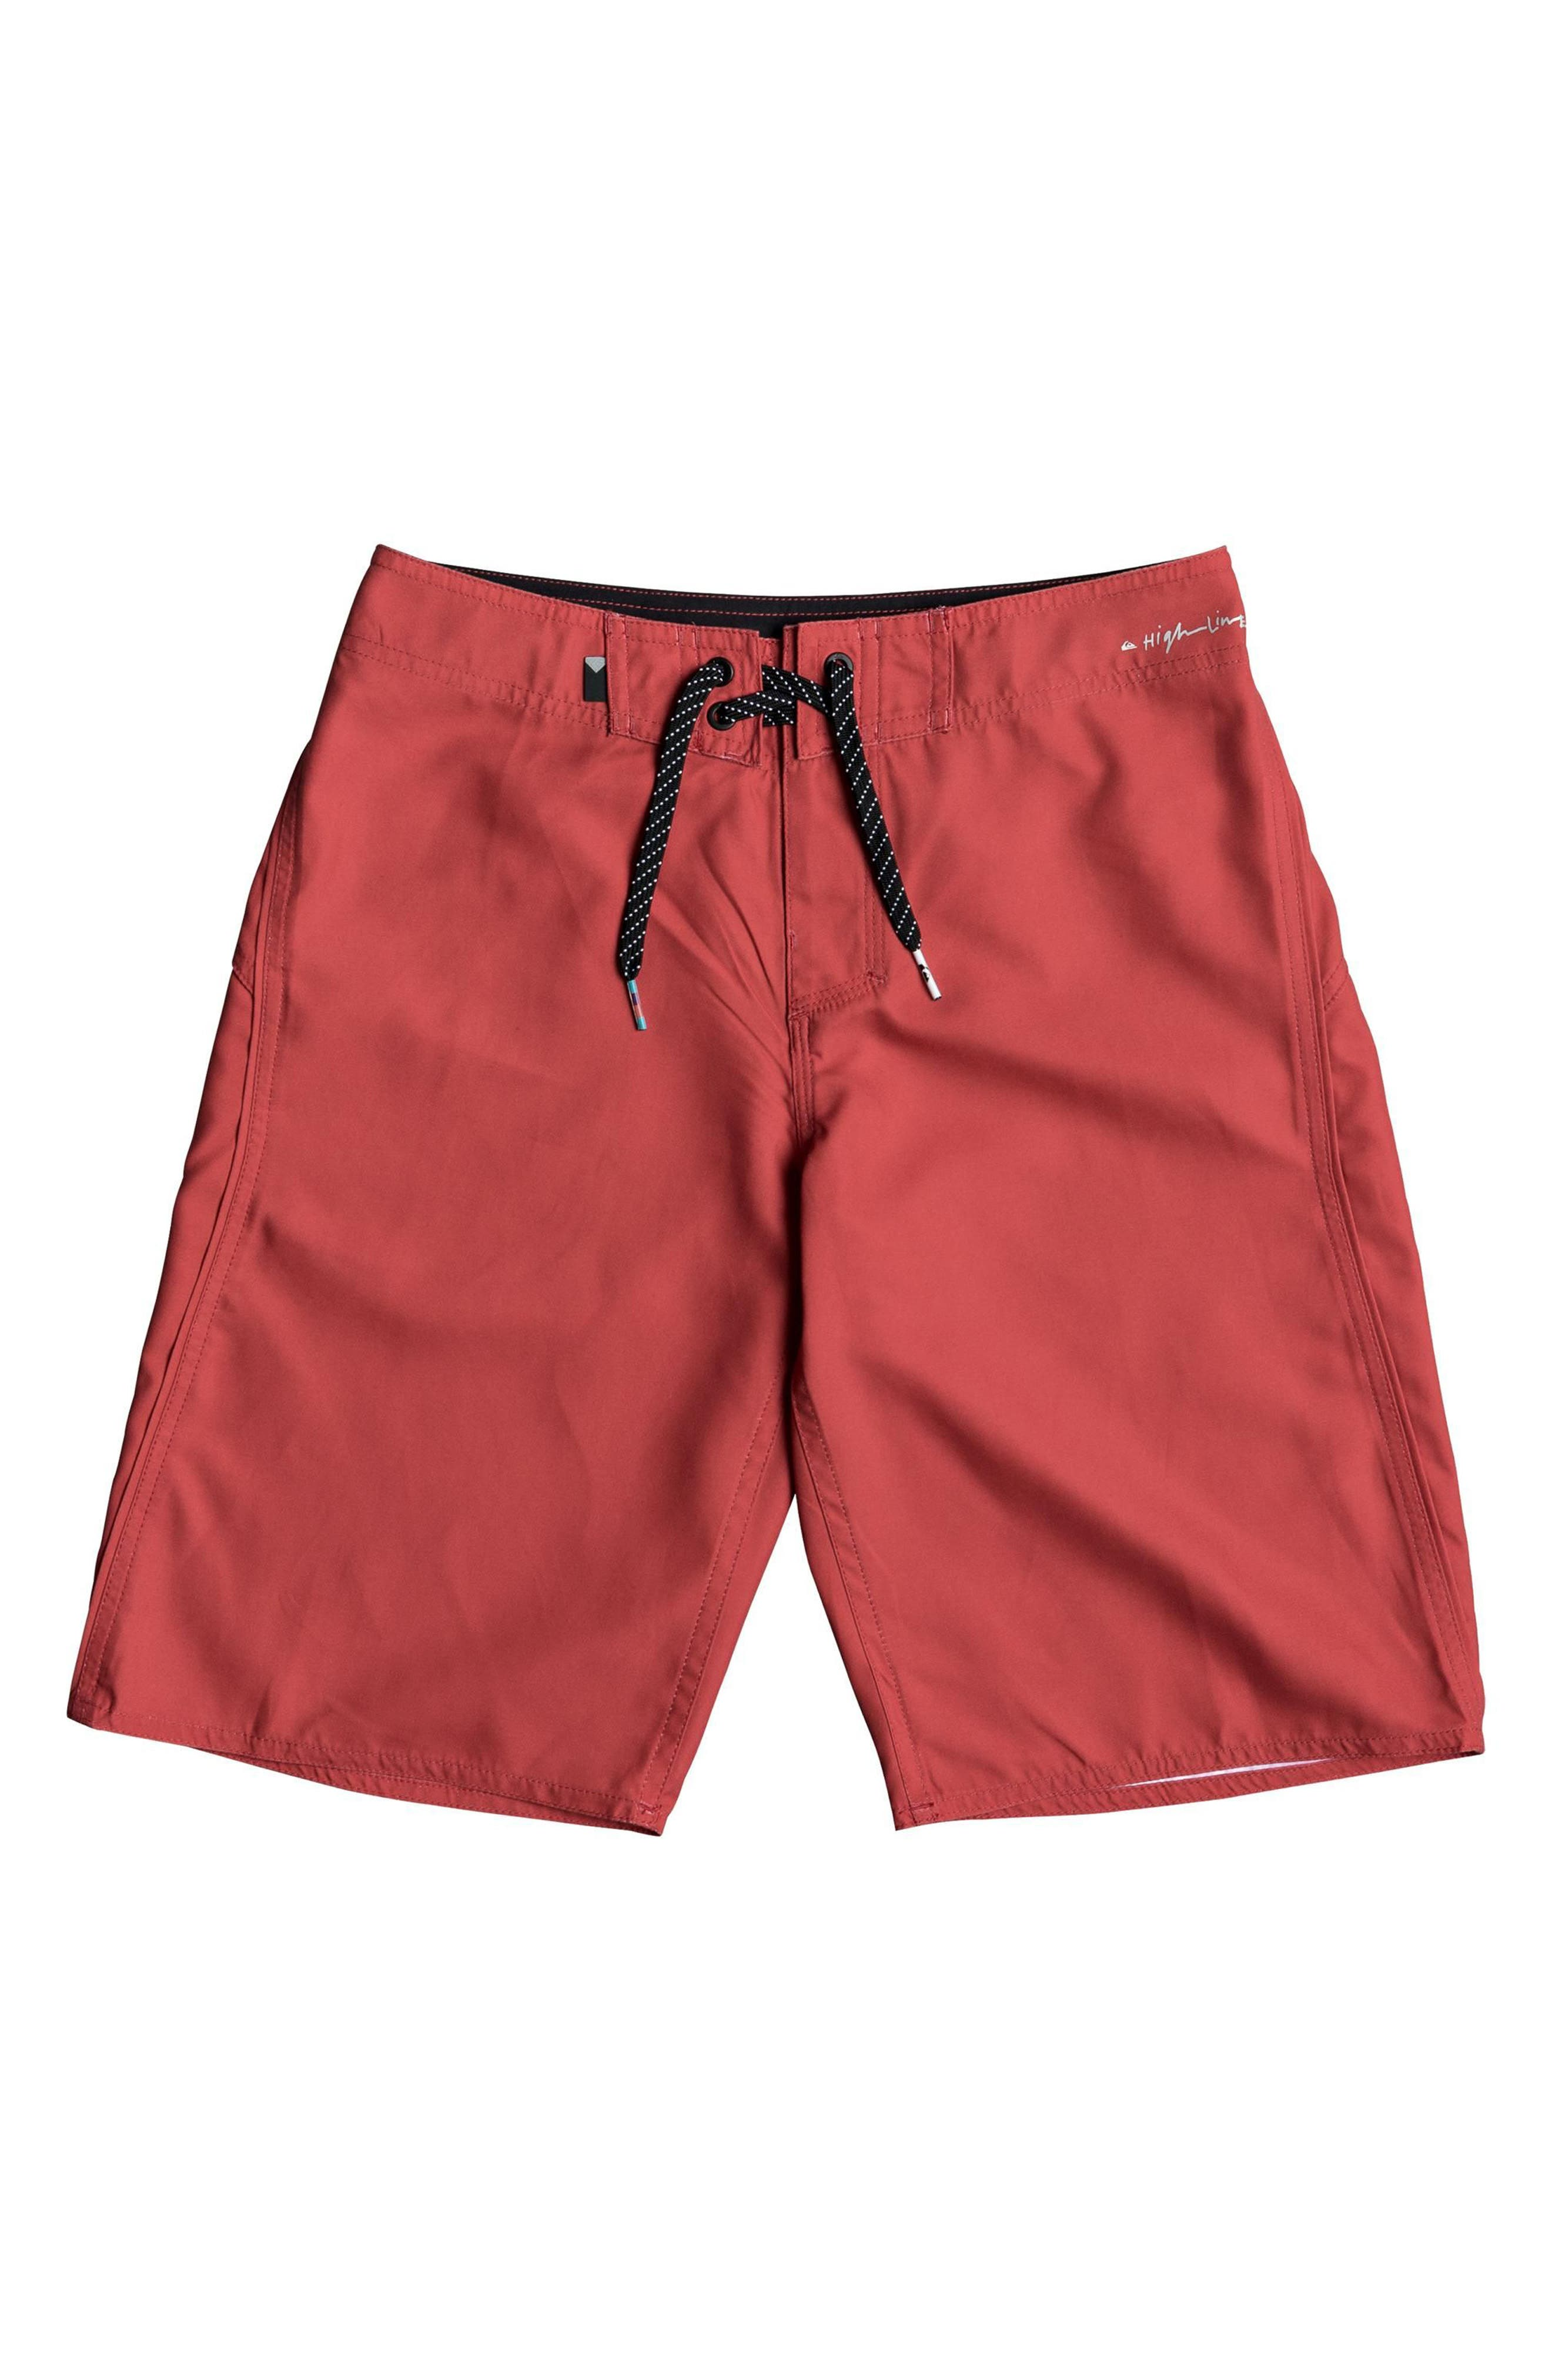 Highline Kaimana Board Shorts,                         Main,                         color, Red